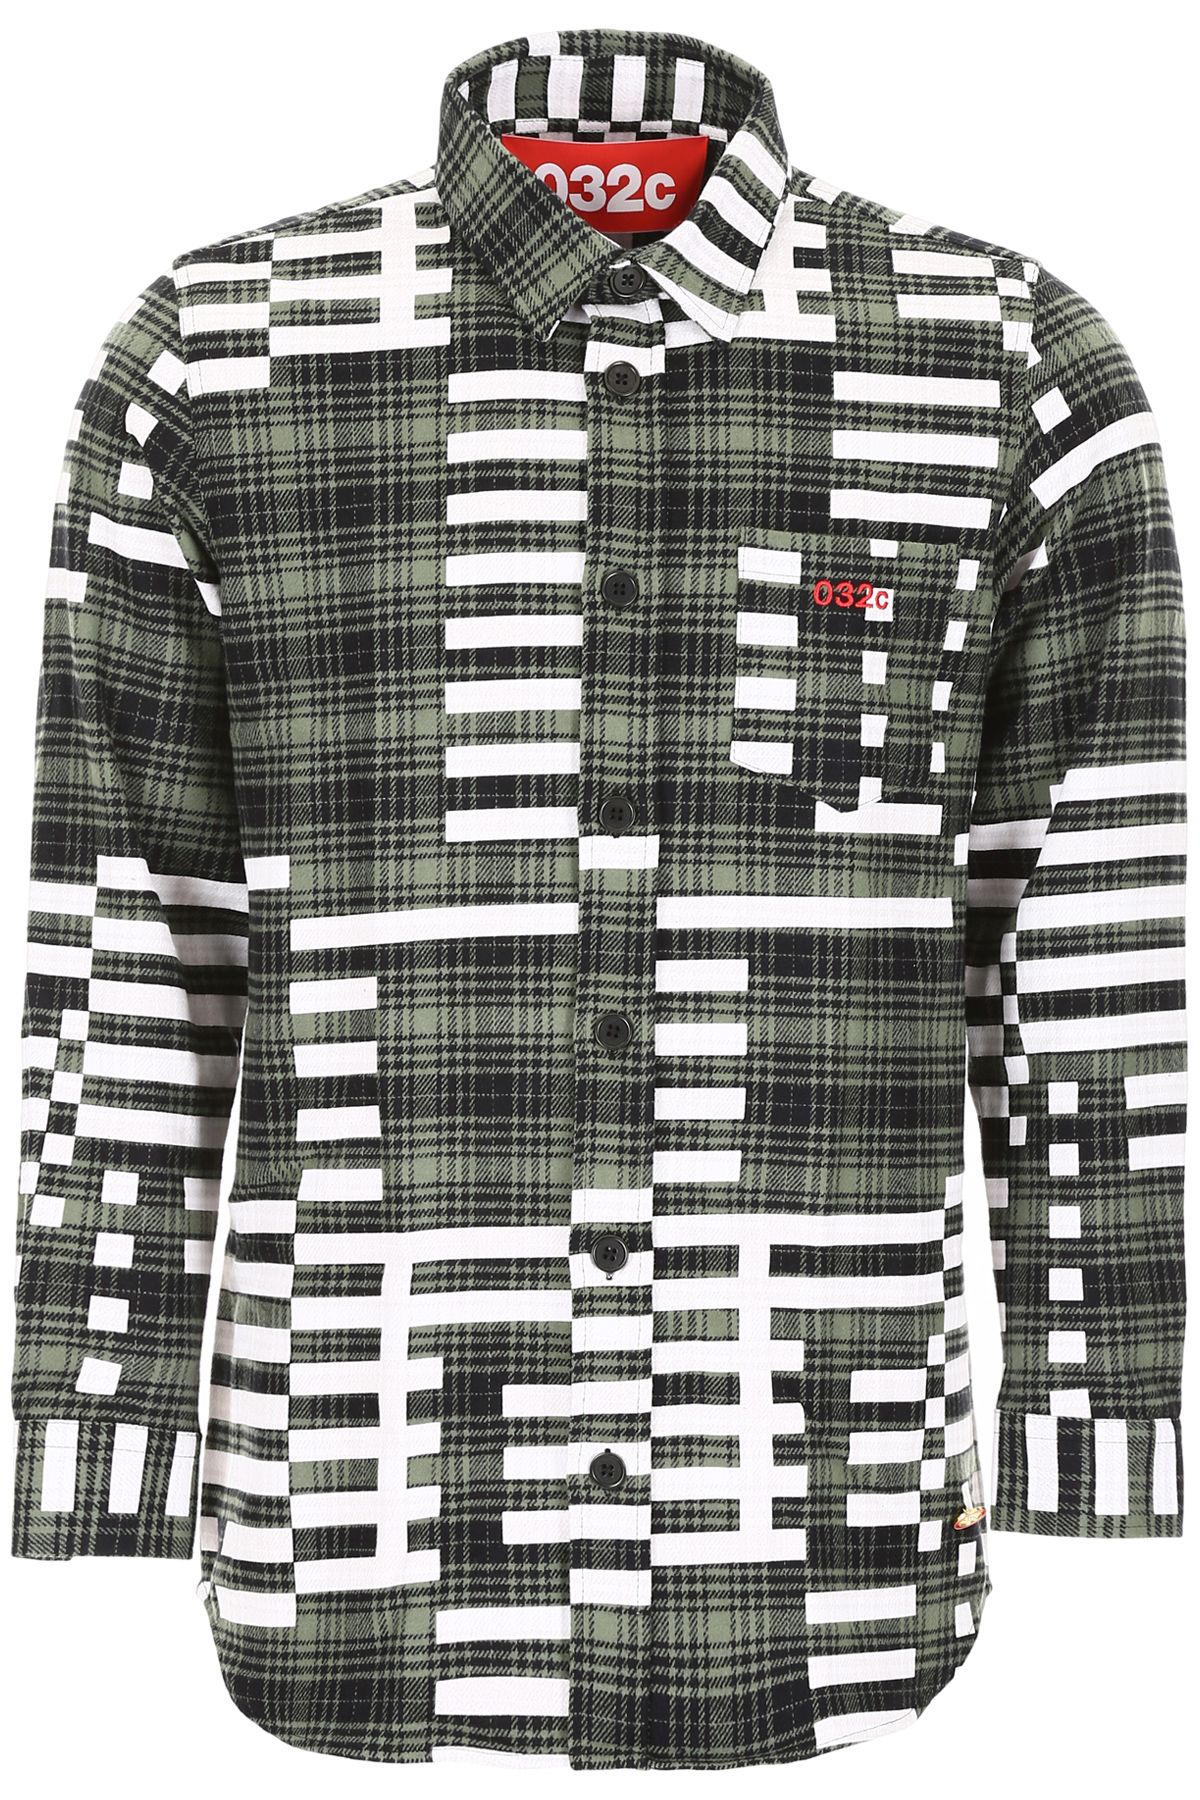 032c Check Flannel Shirt